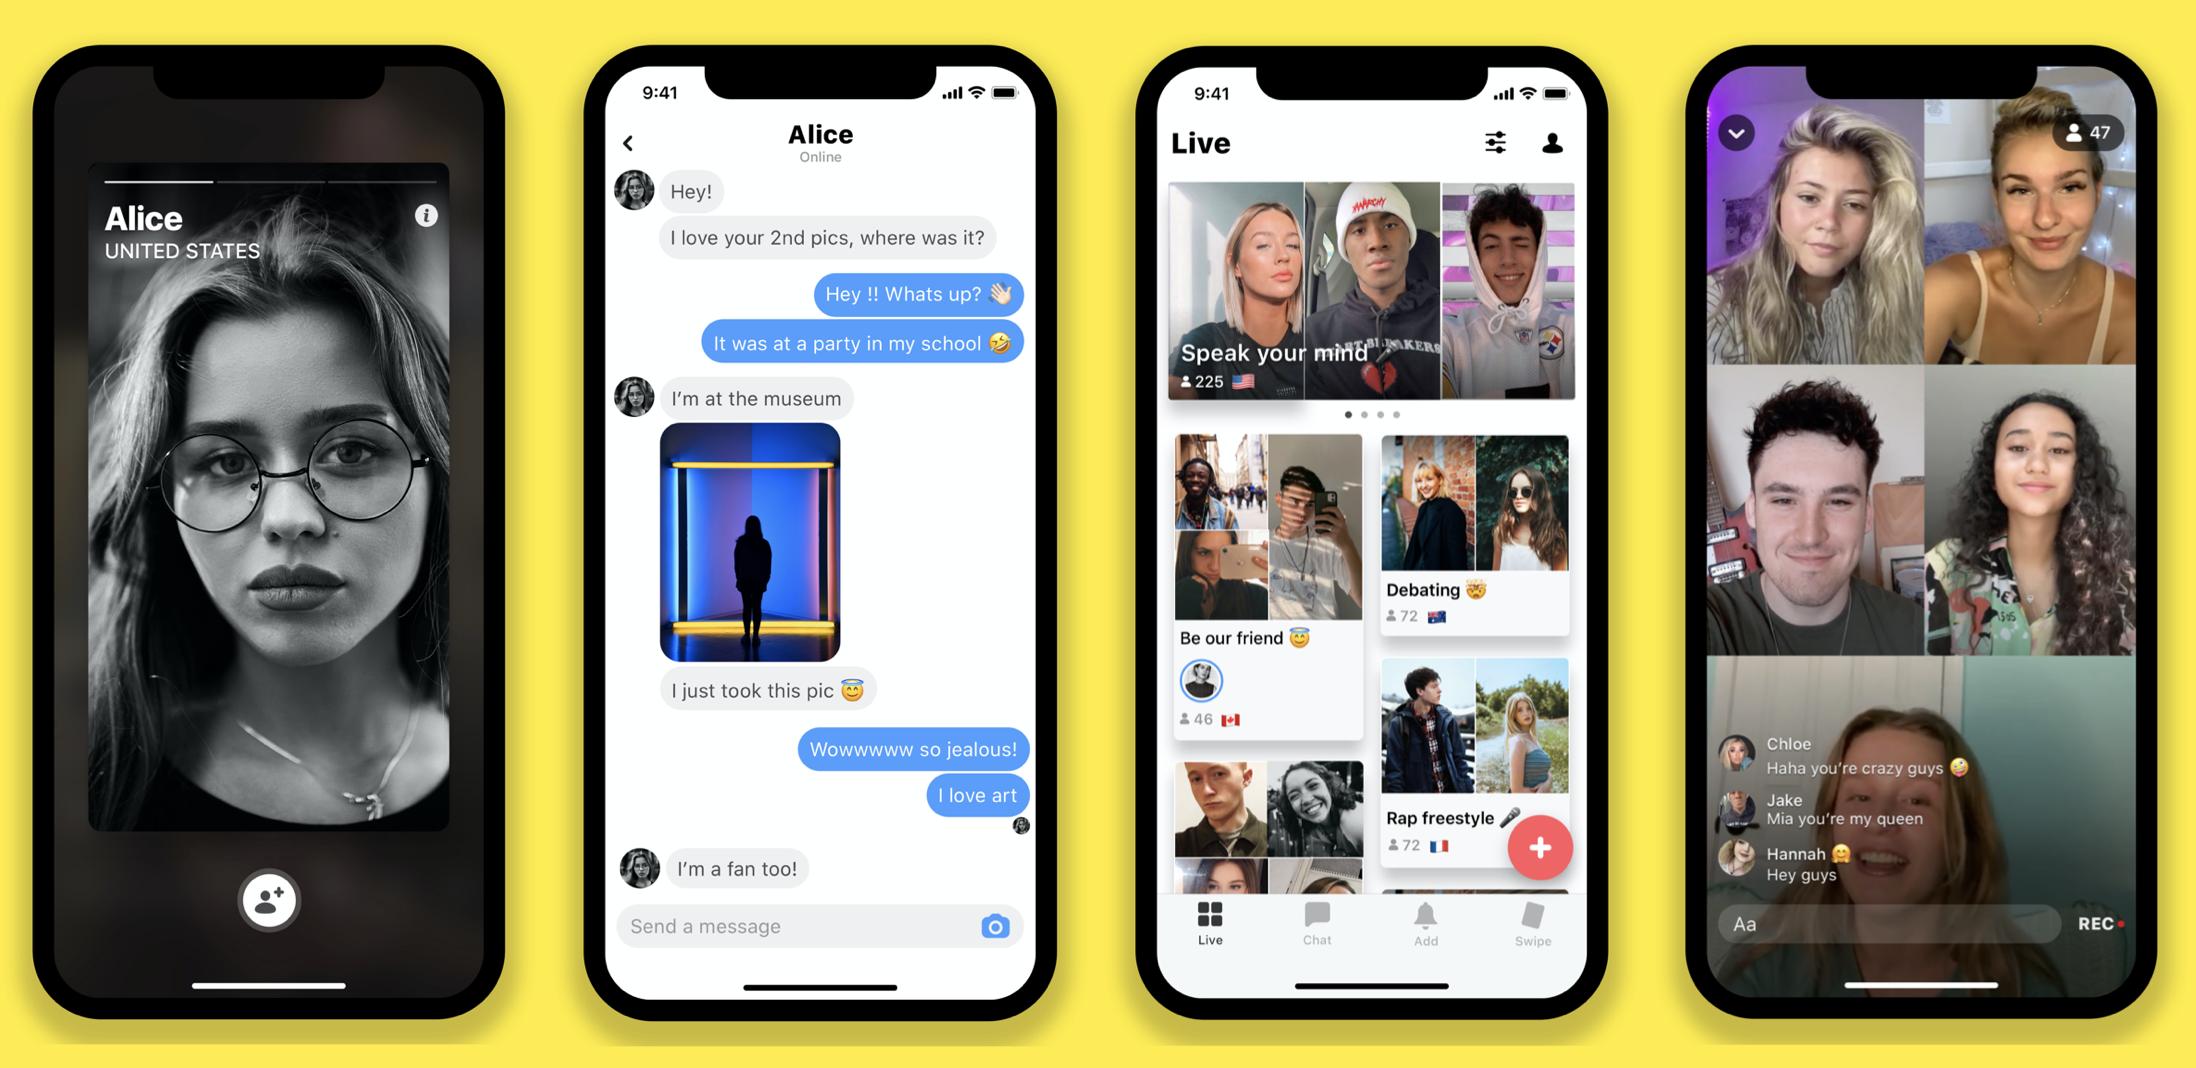 Yubo could be the next big social app as it raises .5 million